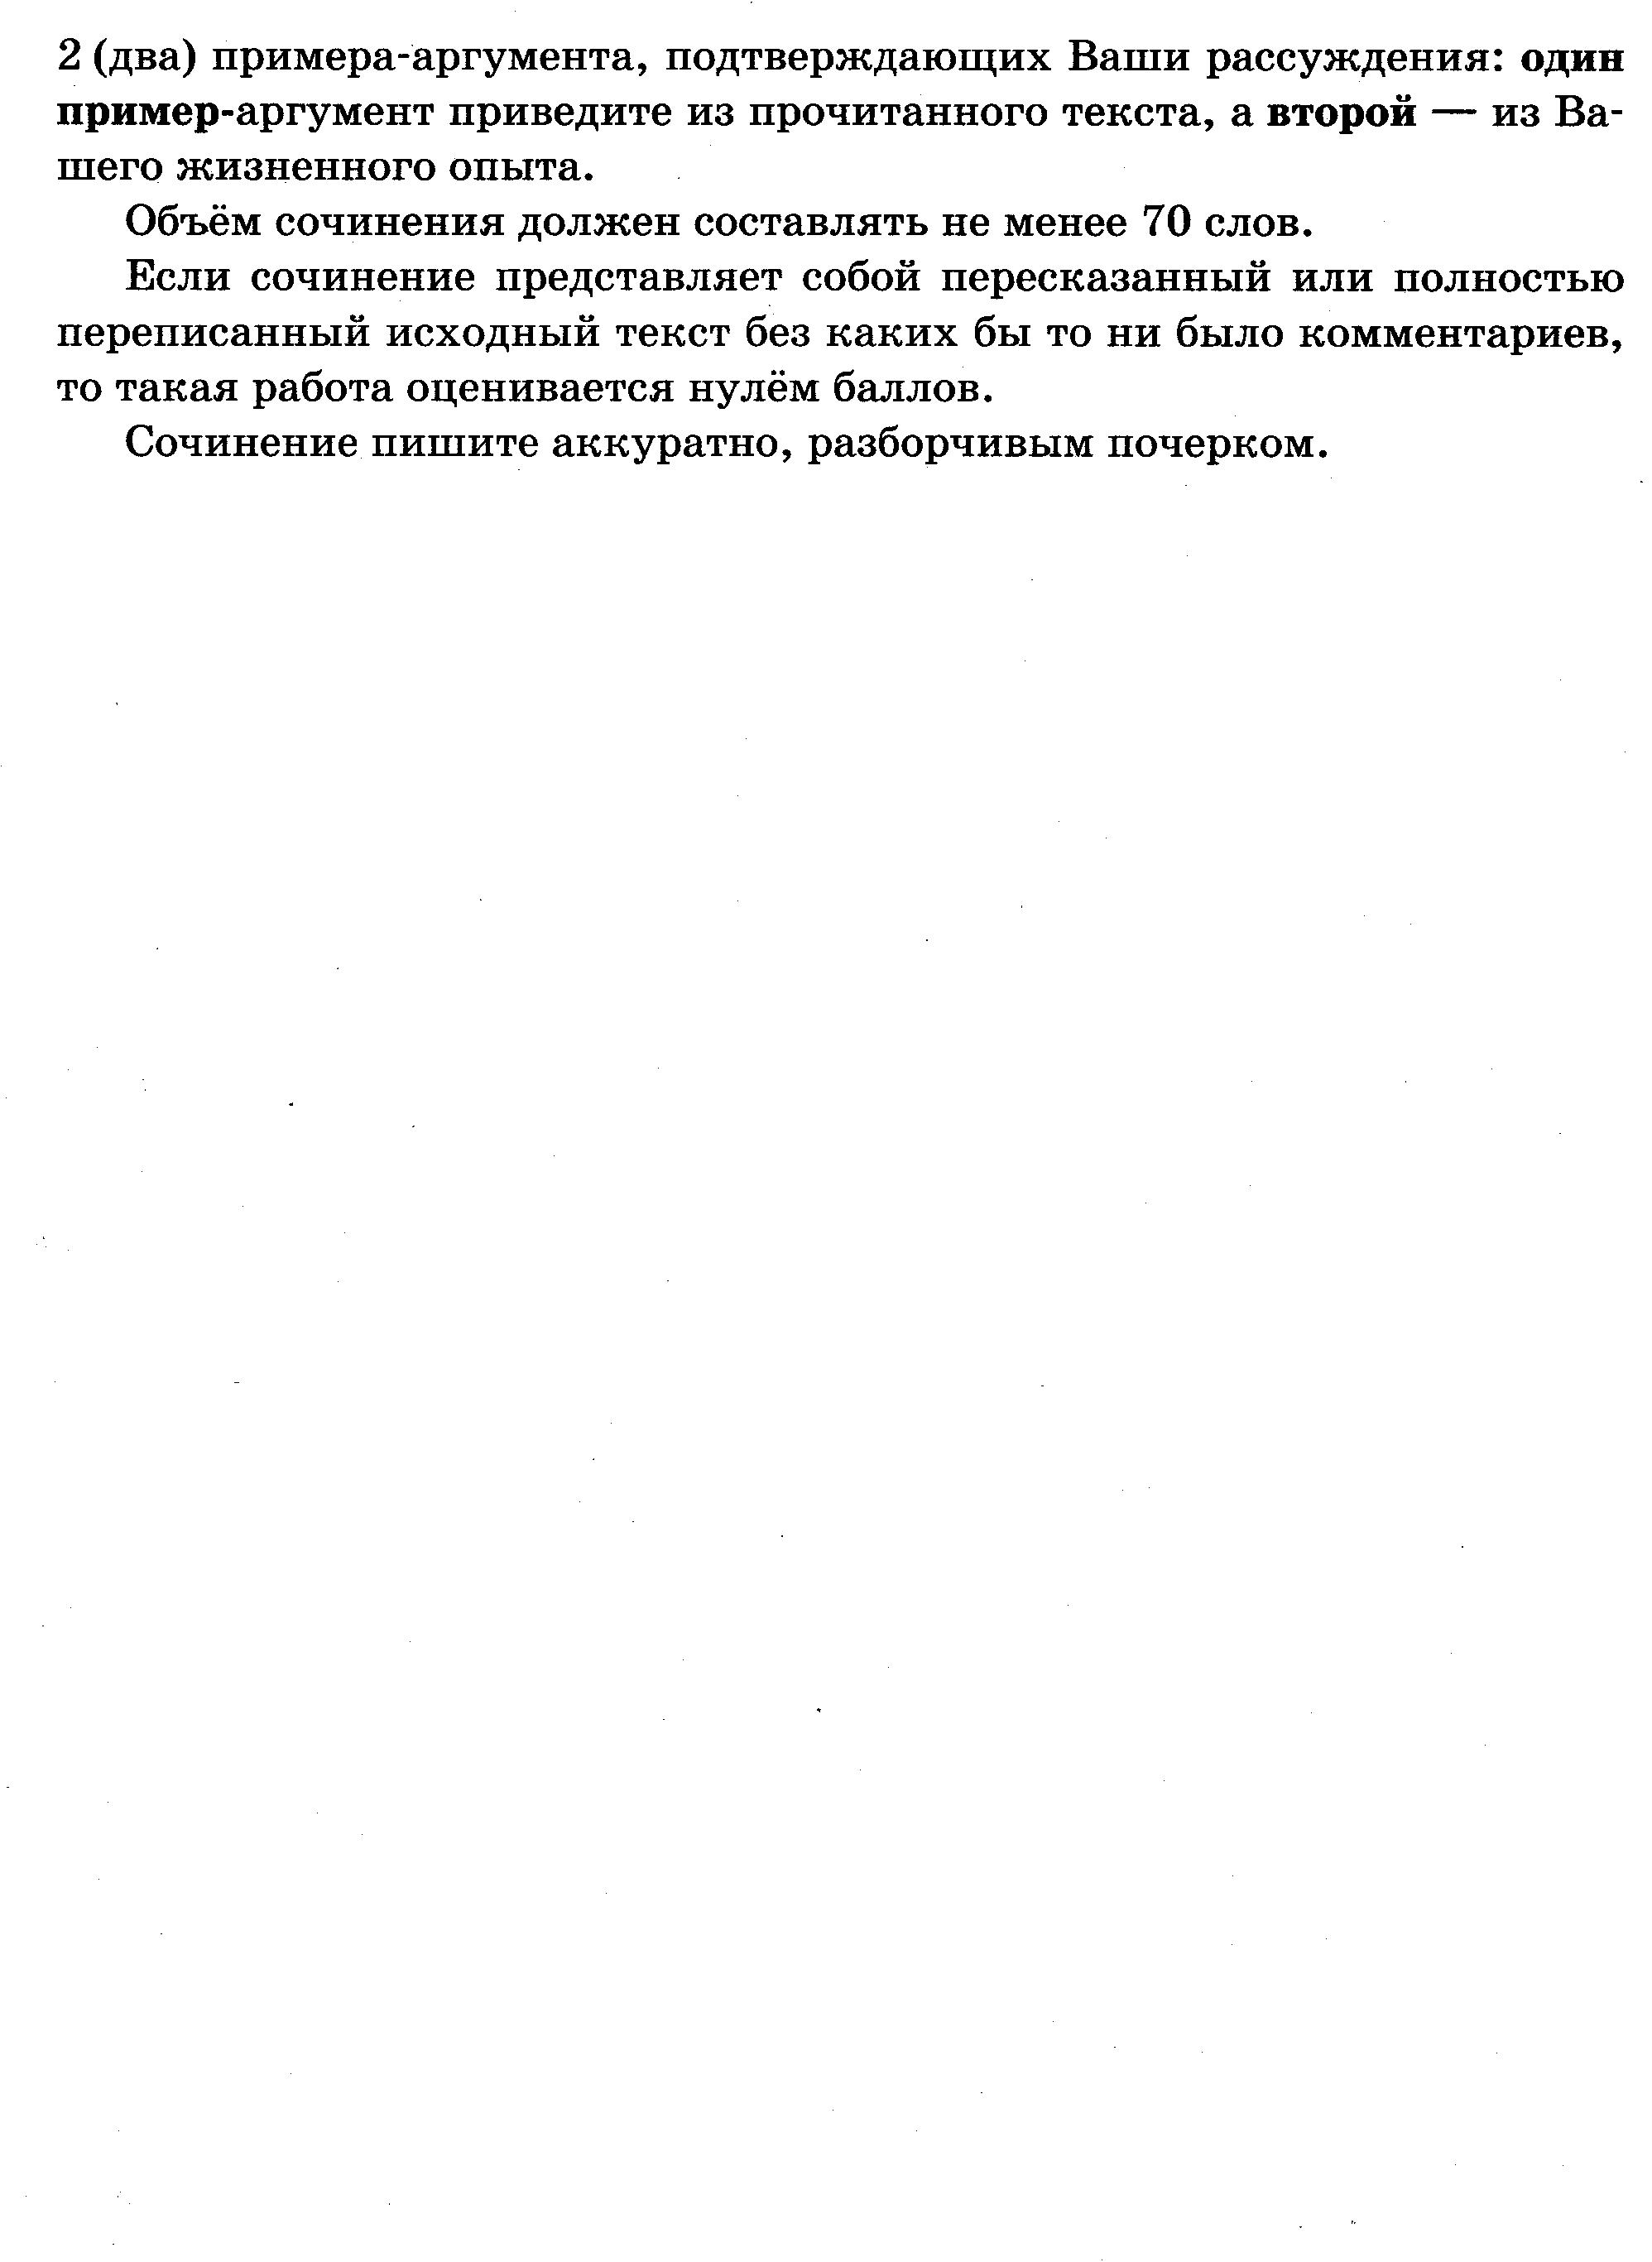 C:\Documents and Settings\Наташа\Рабочий стол\ОГЭ 2016\КИМы Степановой ОГЭ-2016\img288.jpg